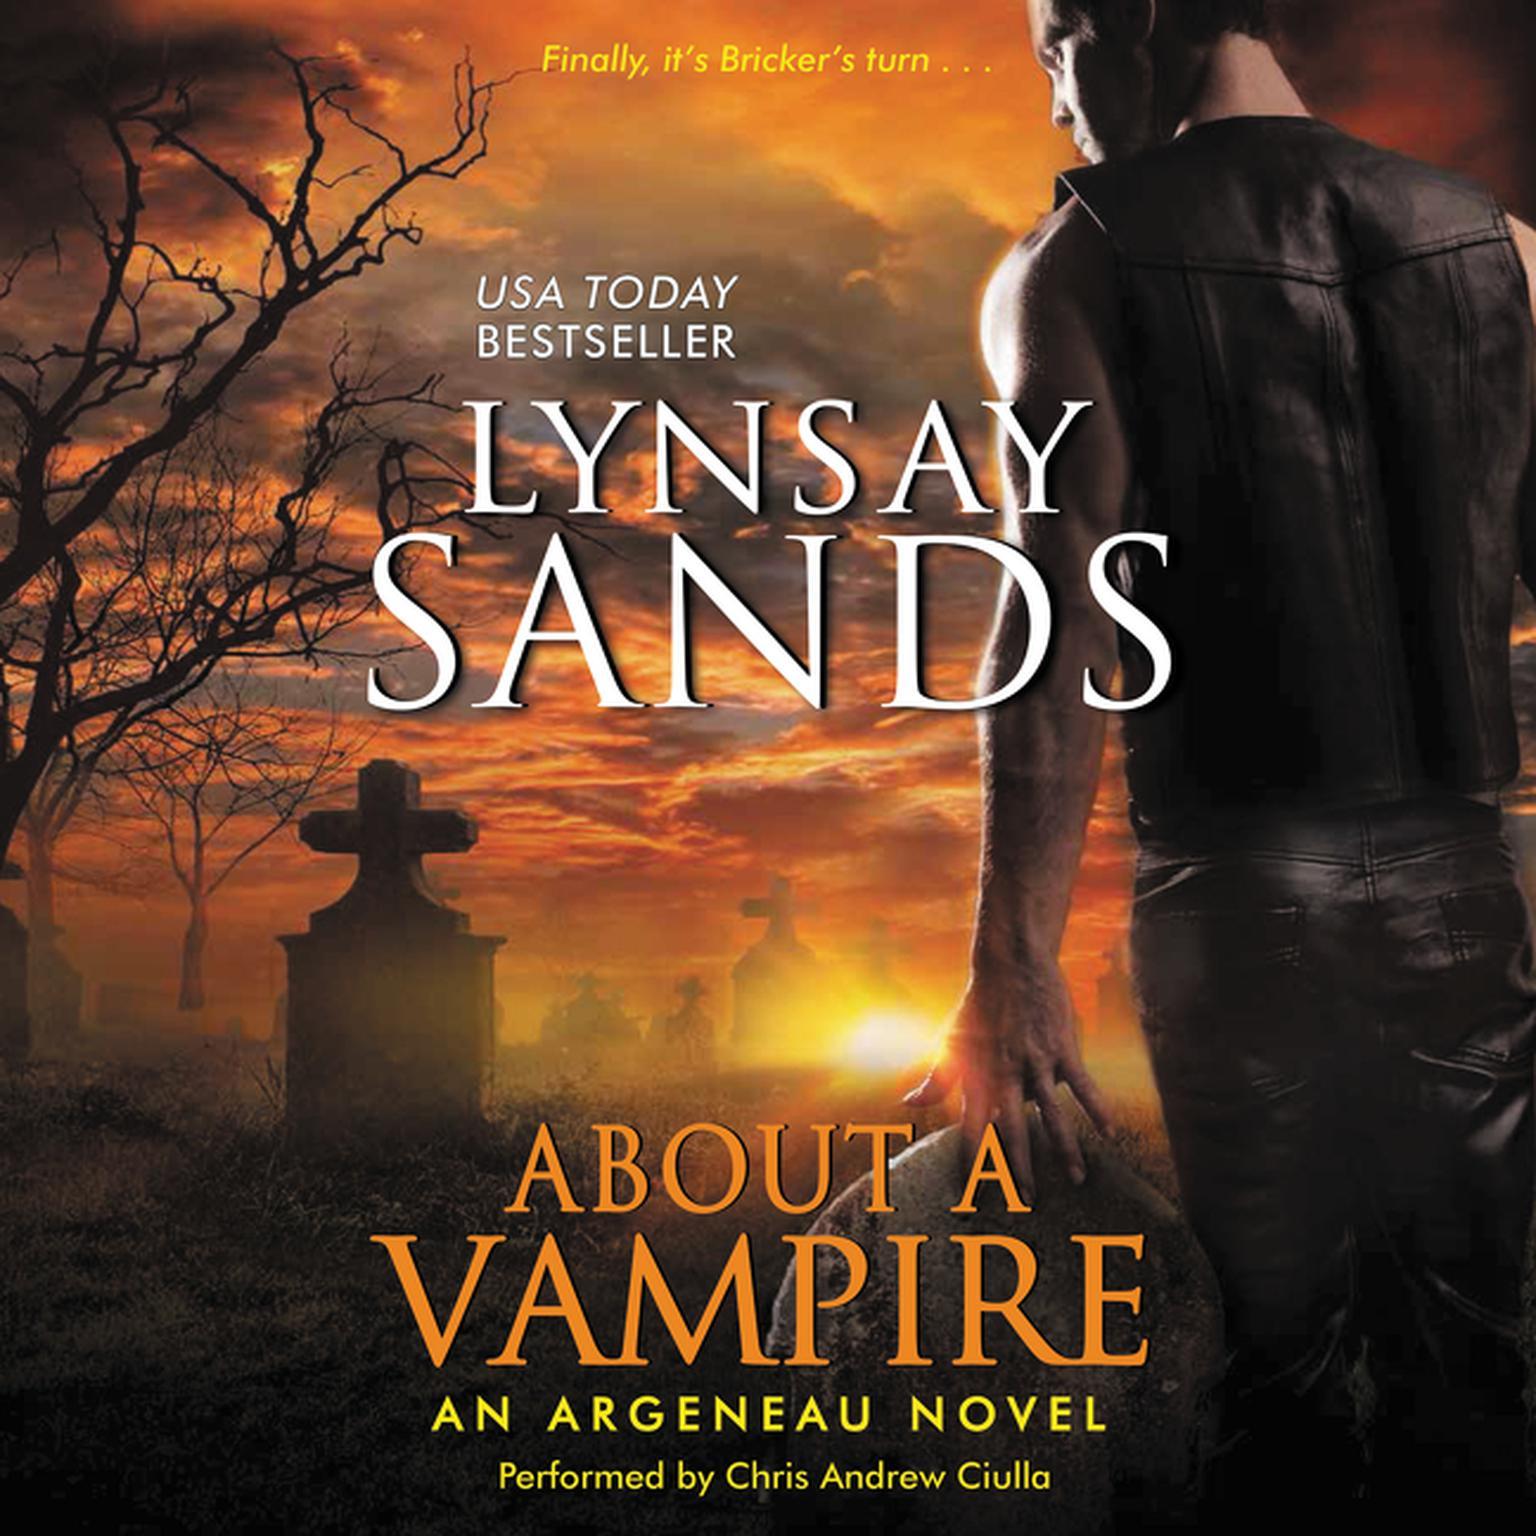 About a Vampire: An Argeneau Novel Audiobook, by Lynsay Sands